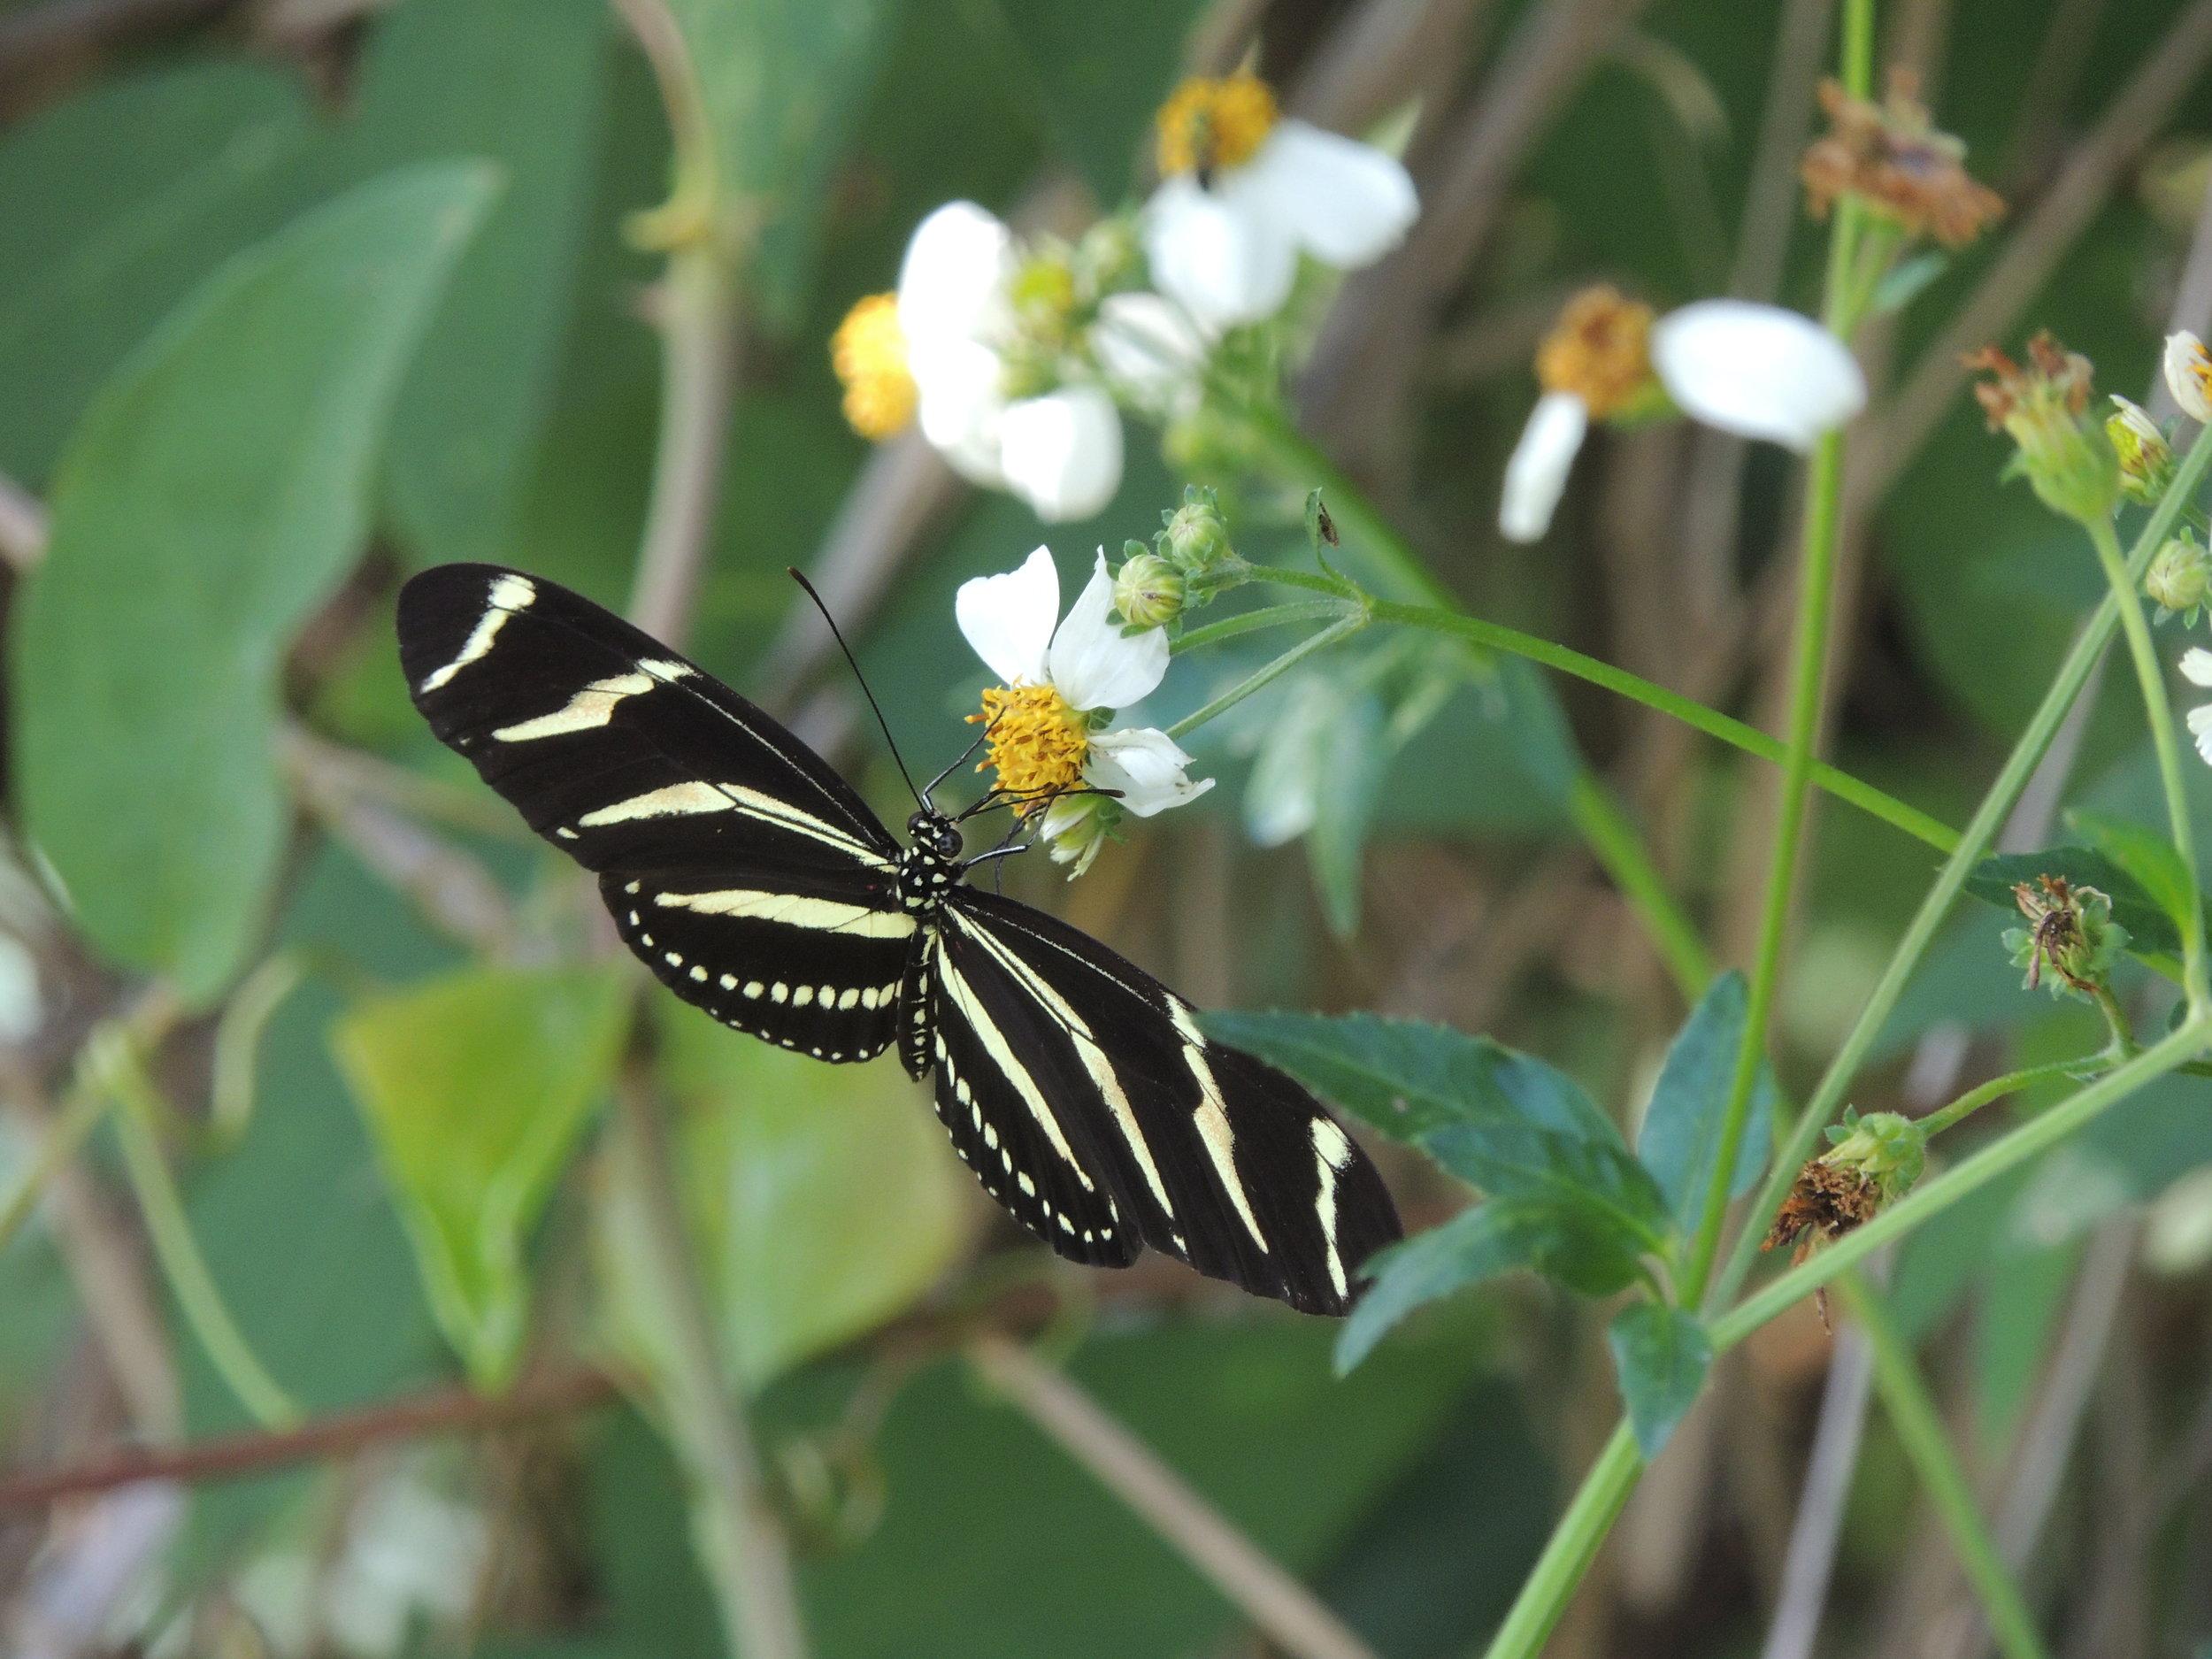 Zebra Longwing Butterfly,  Heliconius charithonia   ,   on Spanish Needles